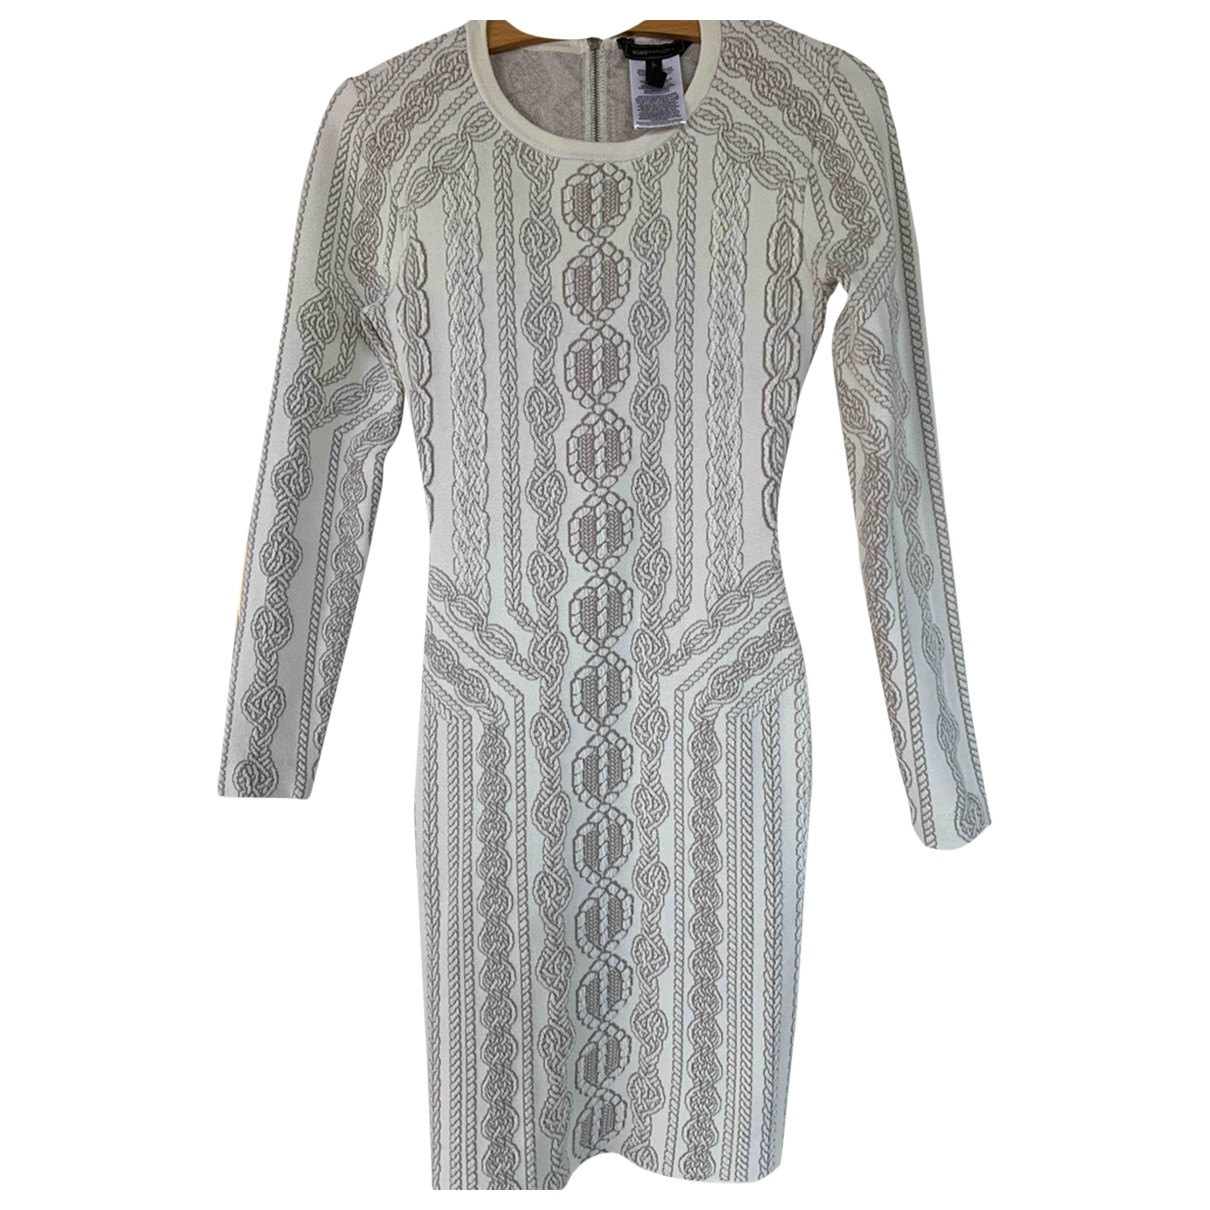 Bcbg Max Azria \N Beige Cotton dress for Women 36 FR